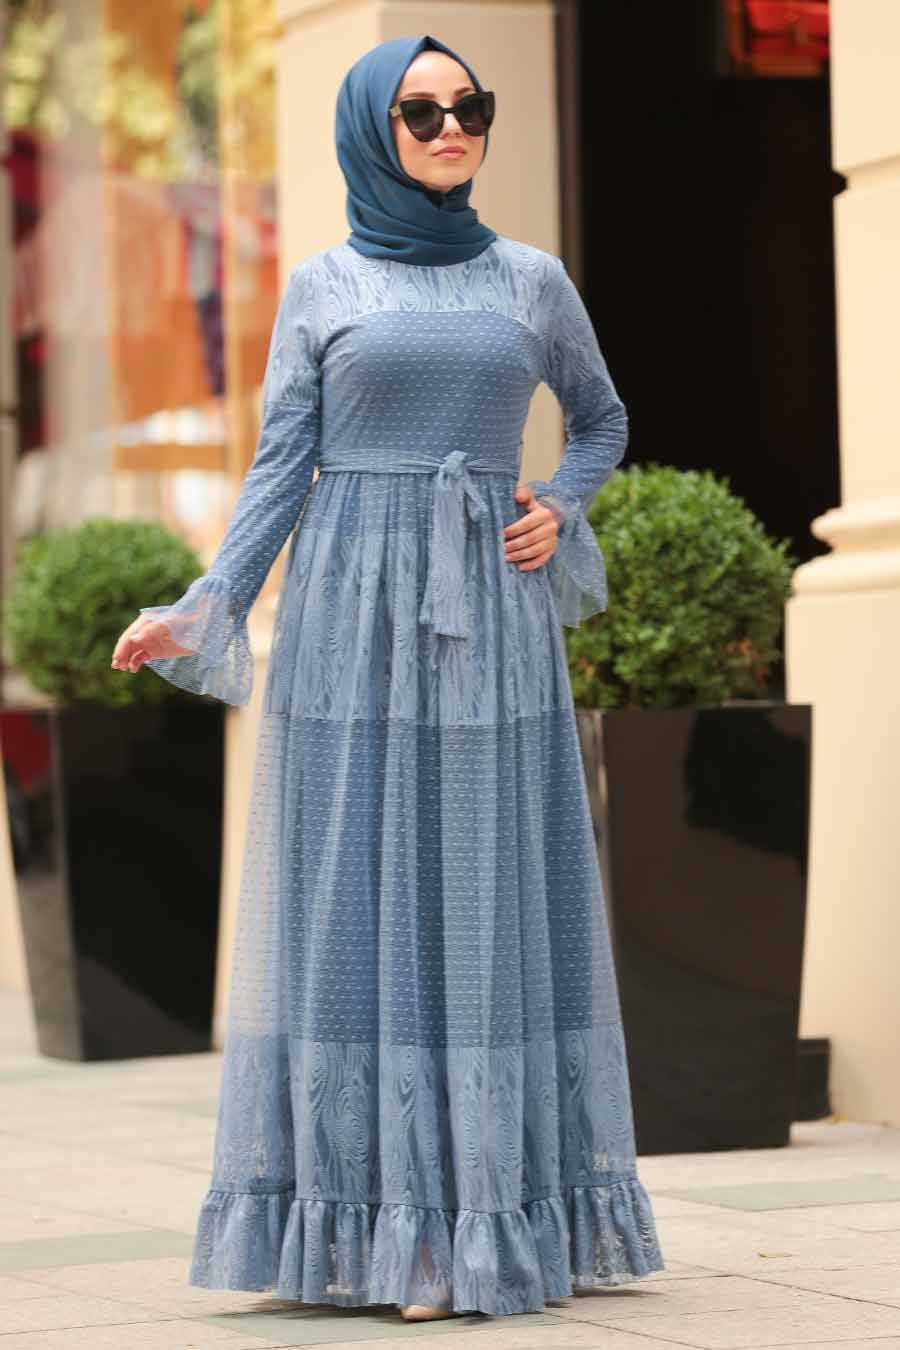 Indigo Blue Hijab Dress 1306IM